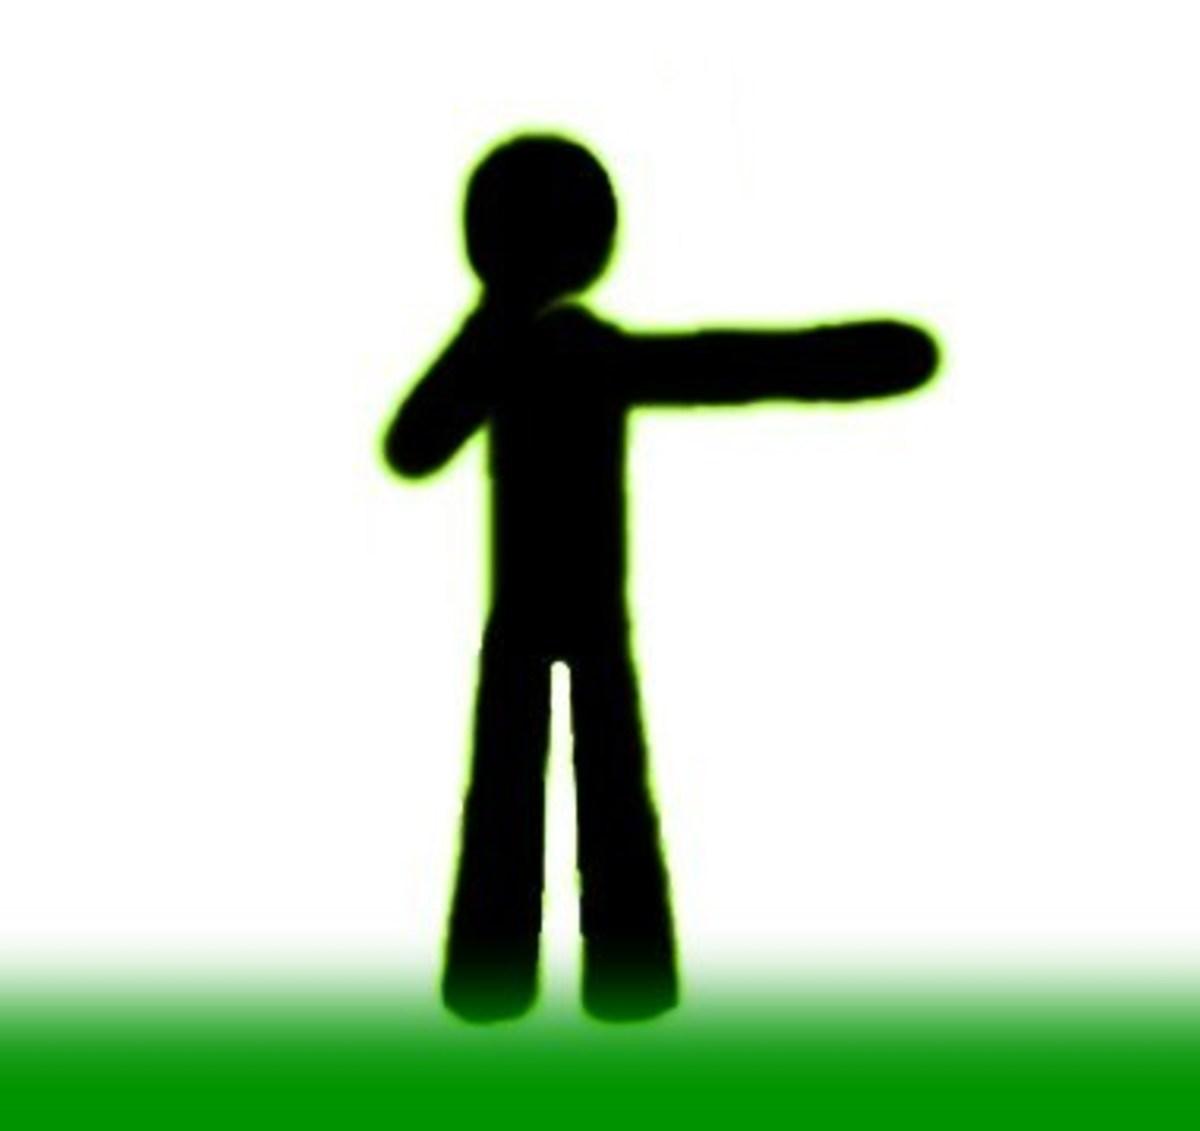 Hand Horizontal and Pointing Forward–Direct Free Kick/New Start